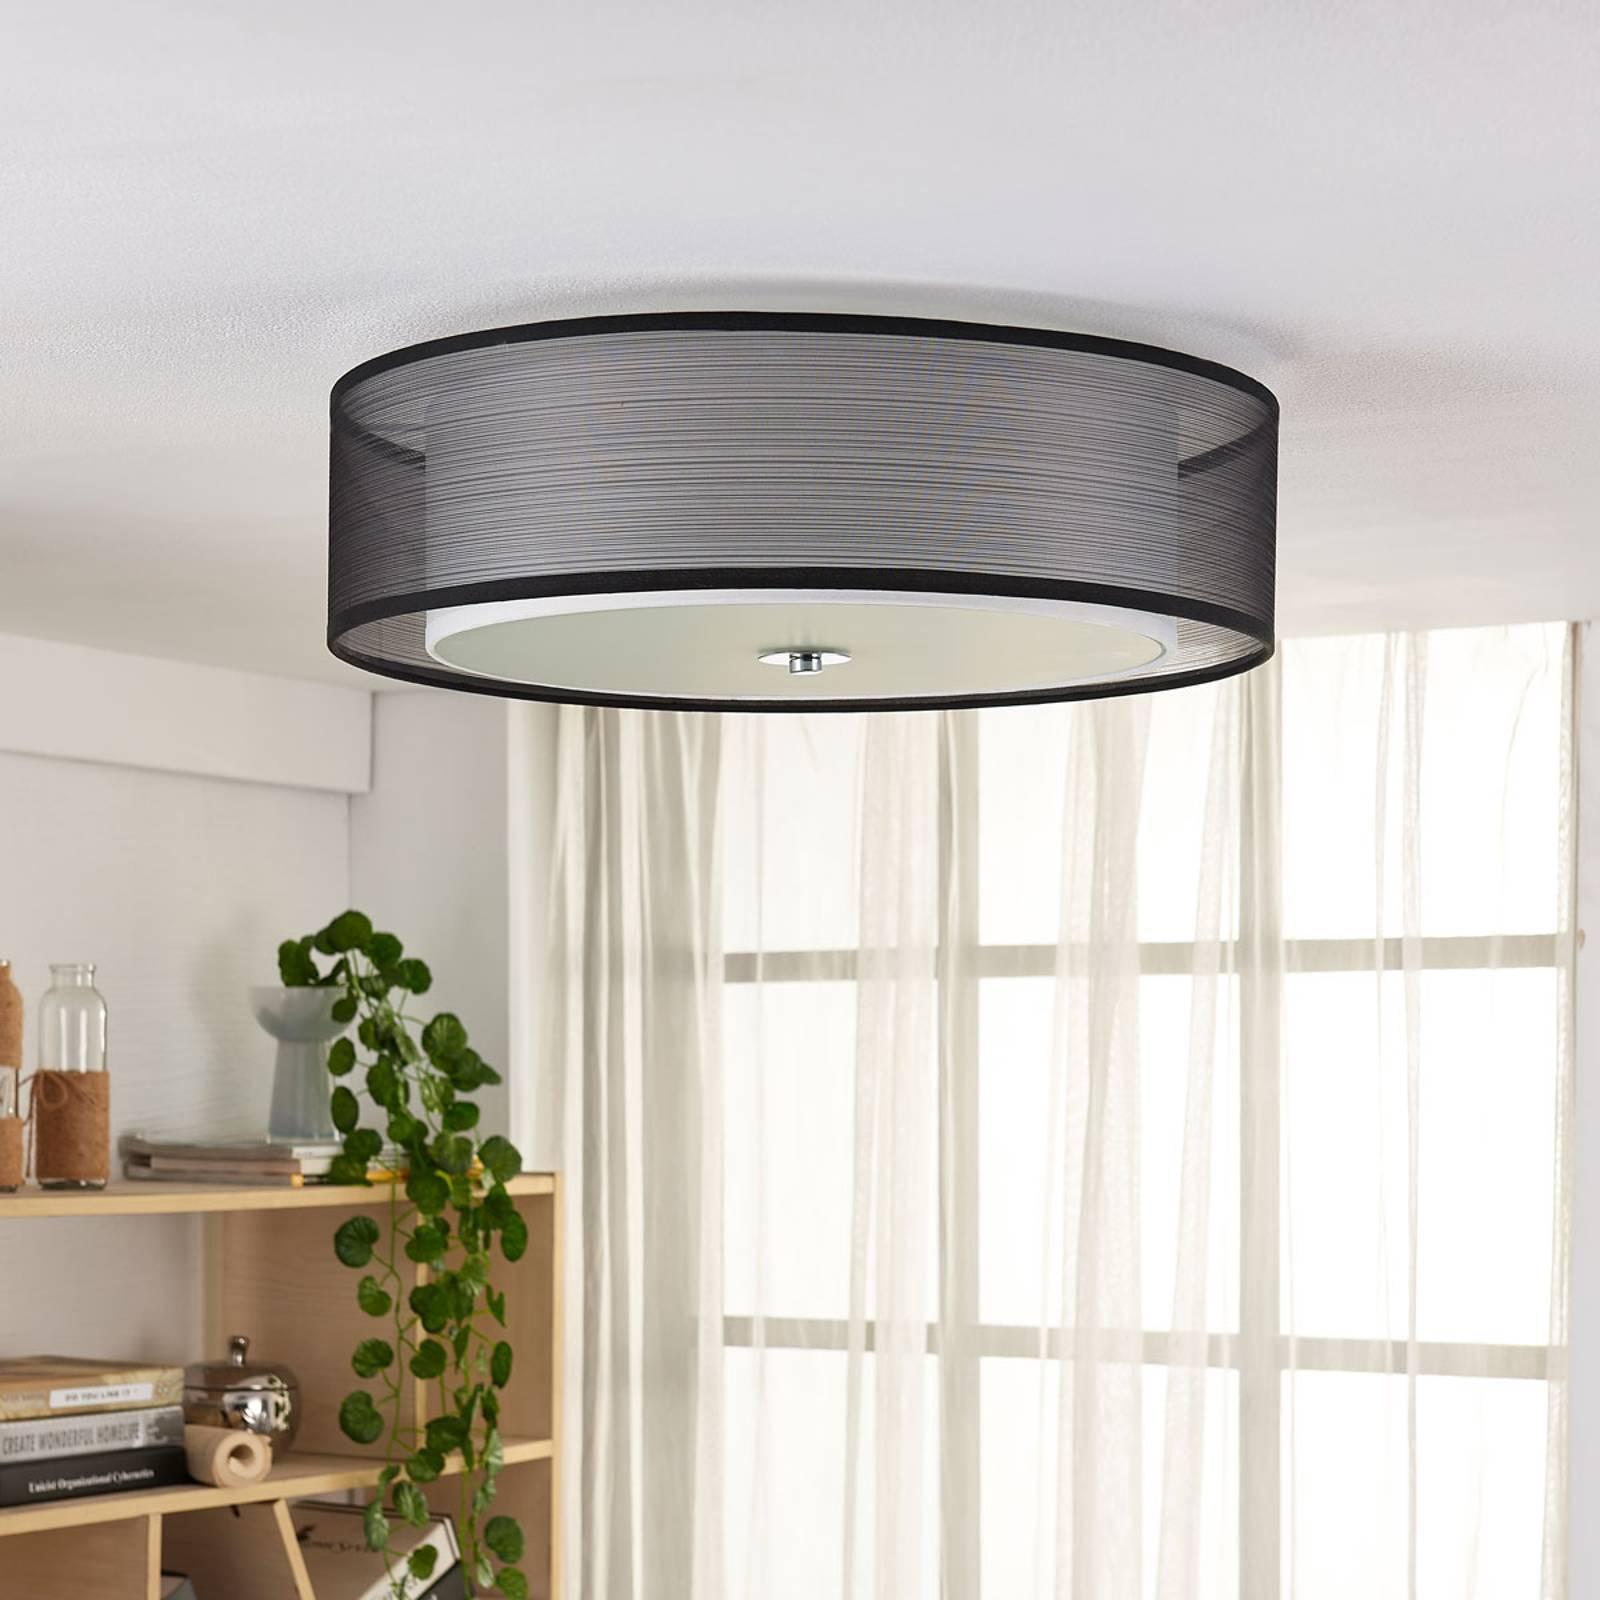 Easydim-LED-kattovalaisin Tobia, organza-varjostin